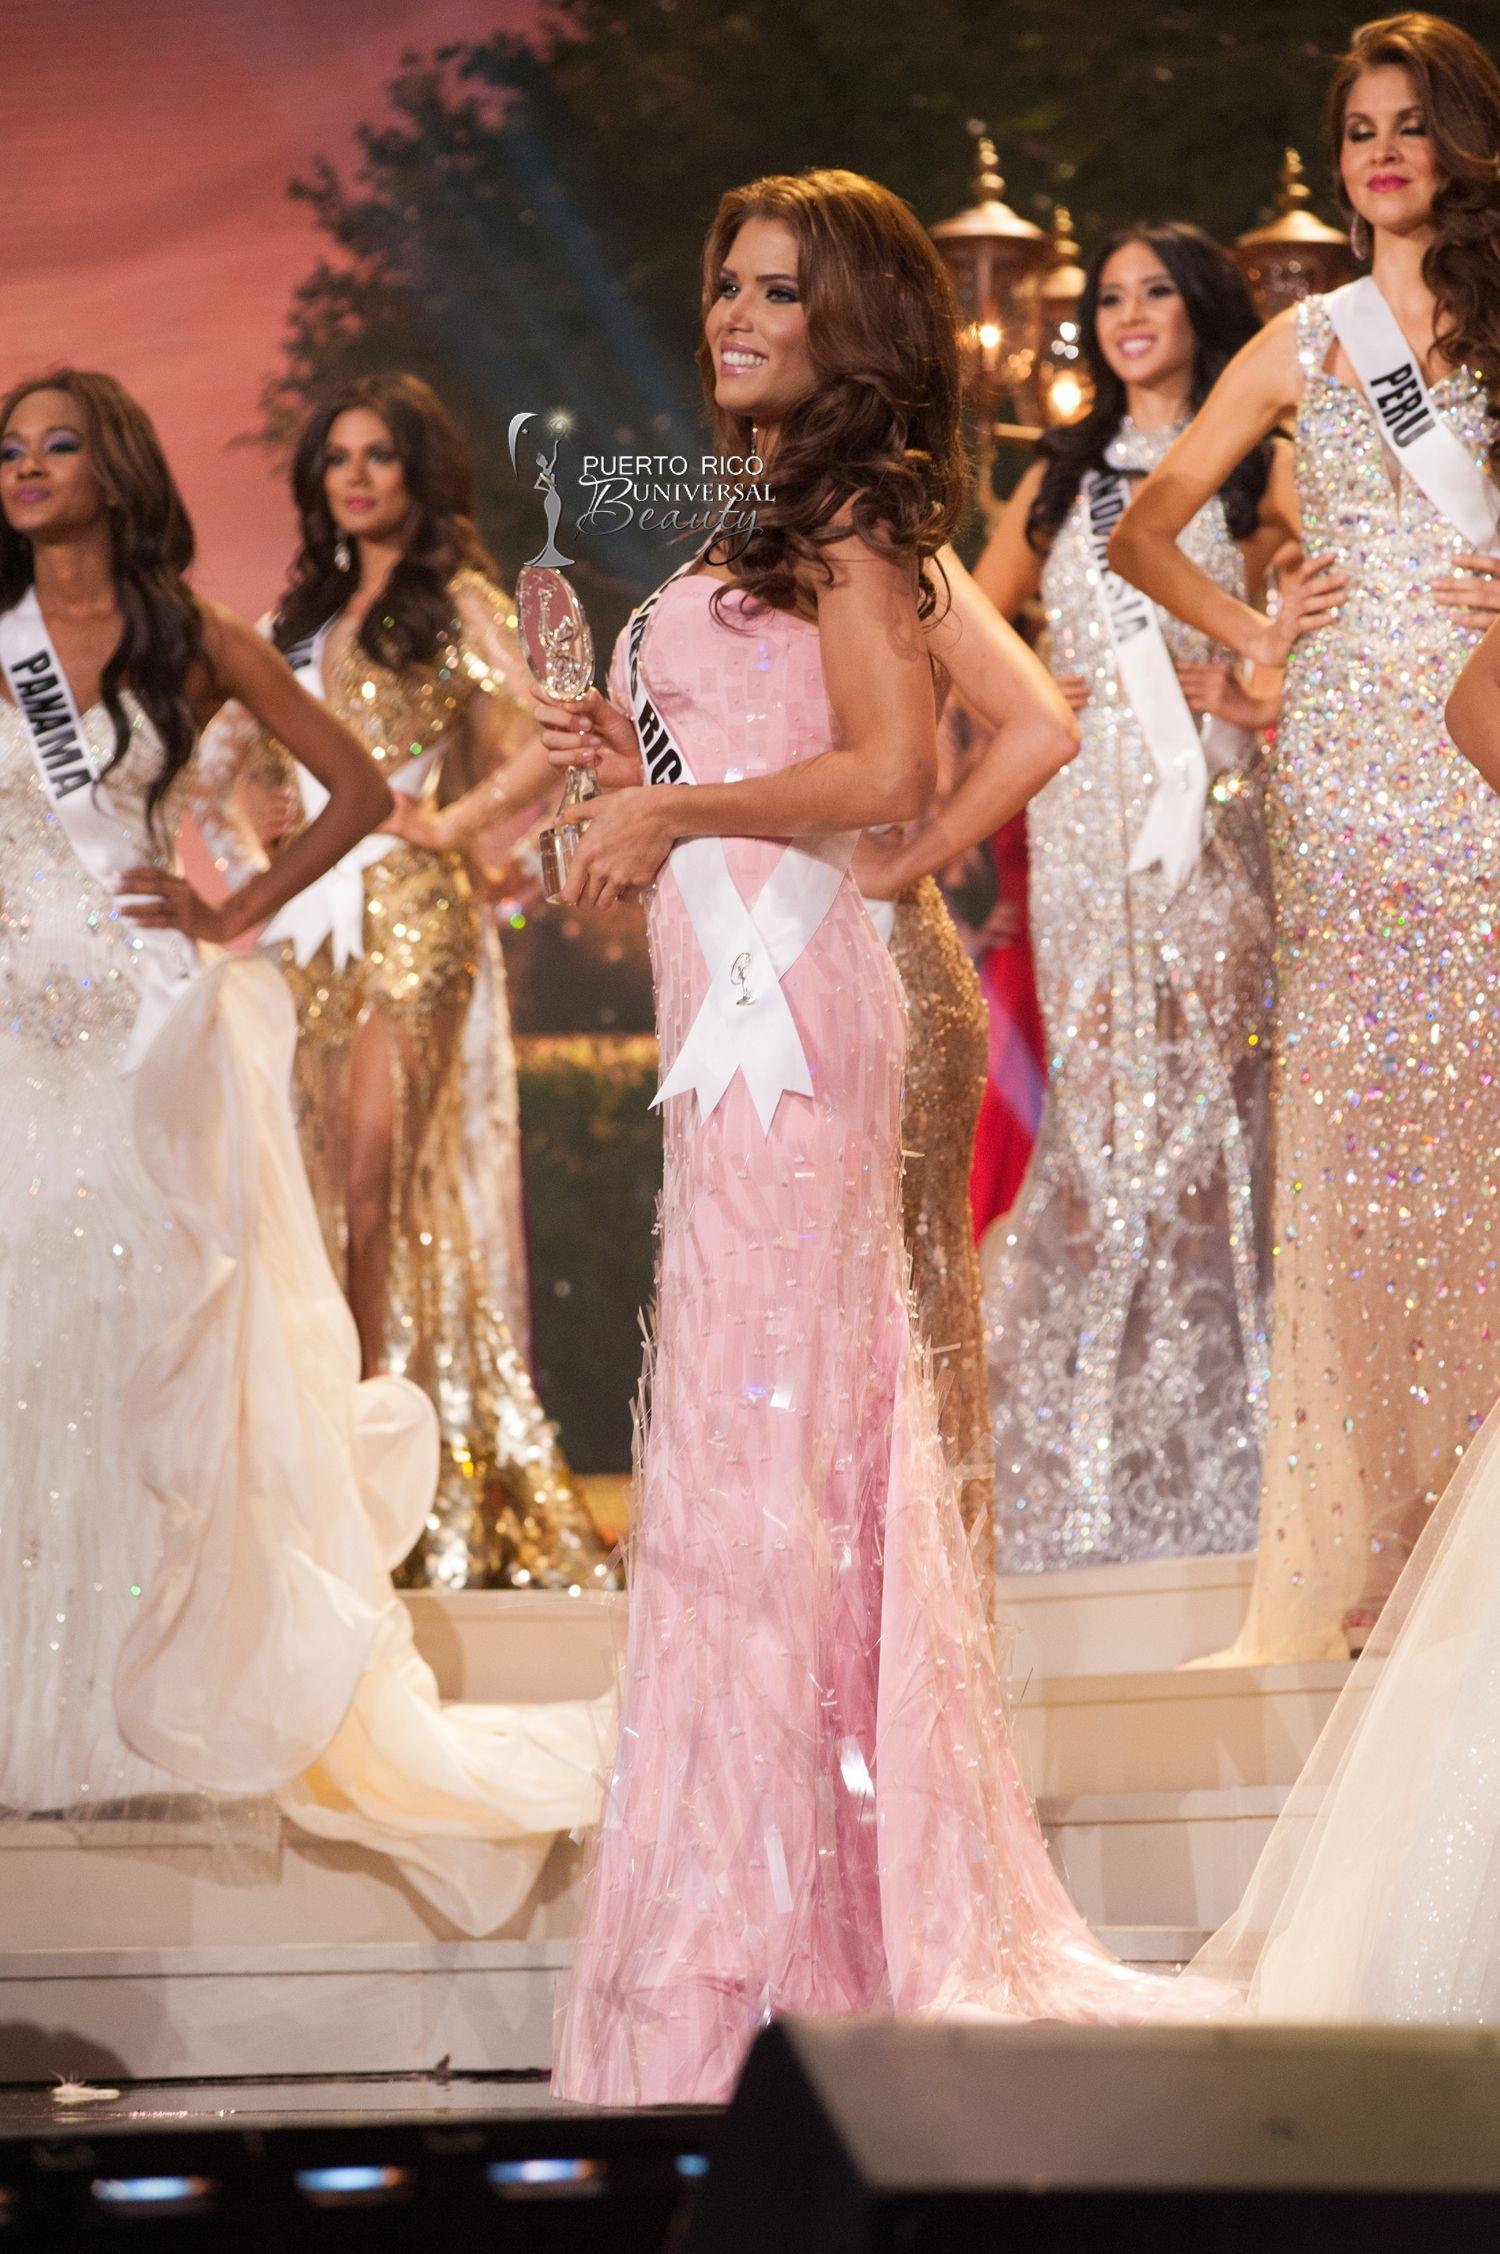 MISS UNIVERSE 2014 - MISS PHOTOGENIC, MISS PUERTO RICO | Gabriela ...